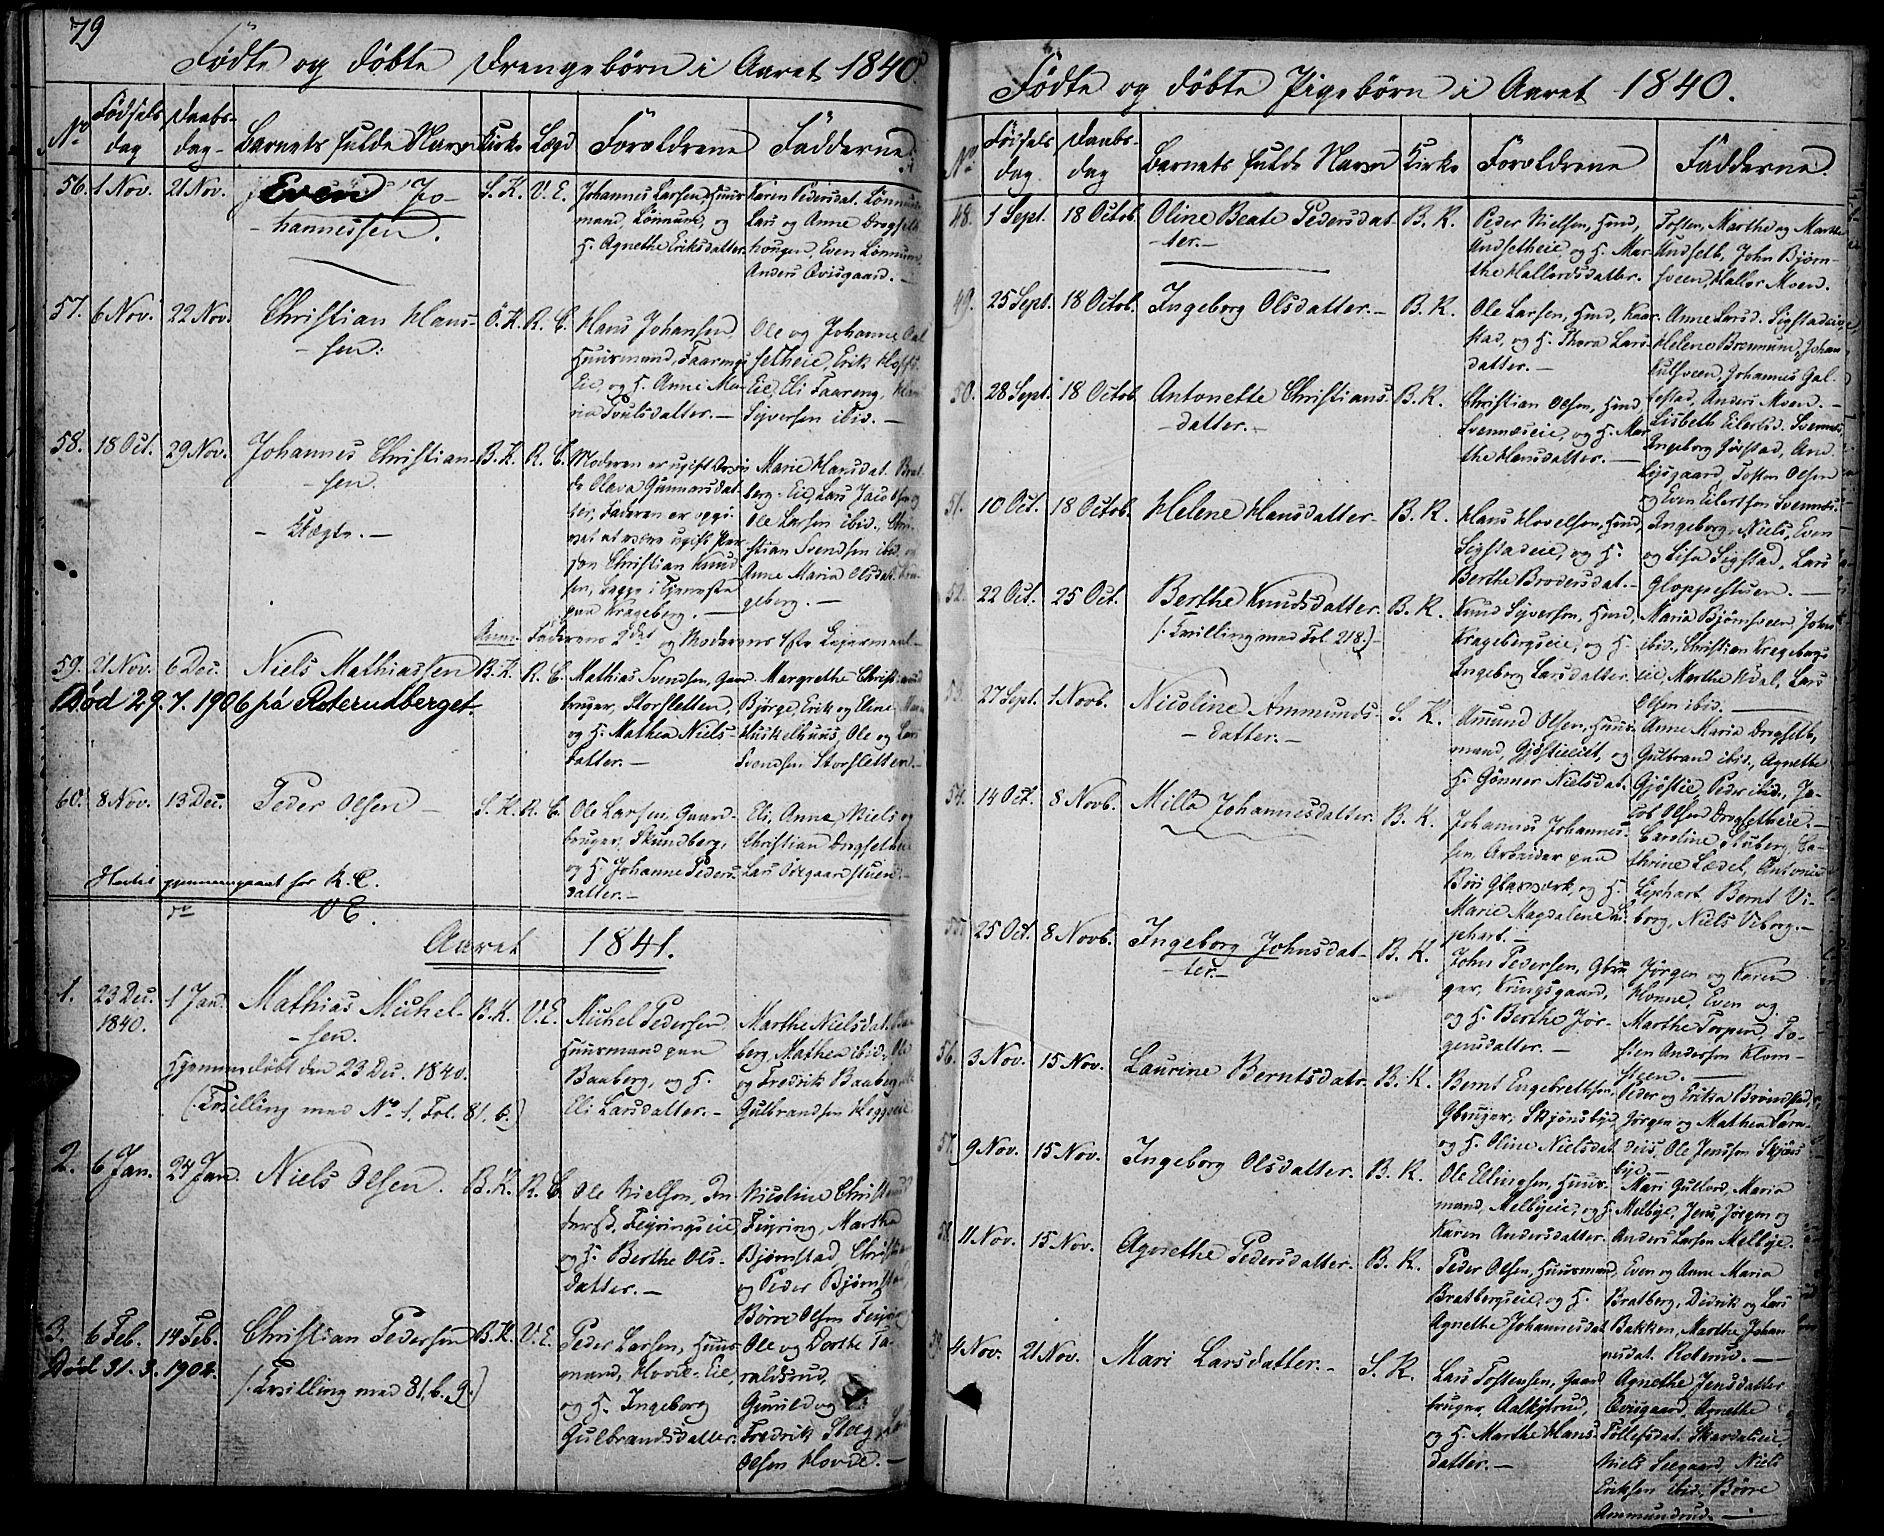 SAH, Biri prestekontor, Ministerialbok nr. 4, 1829-1842, s. 79